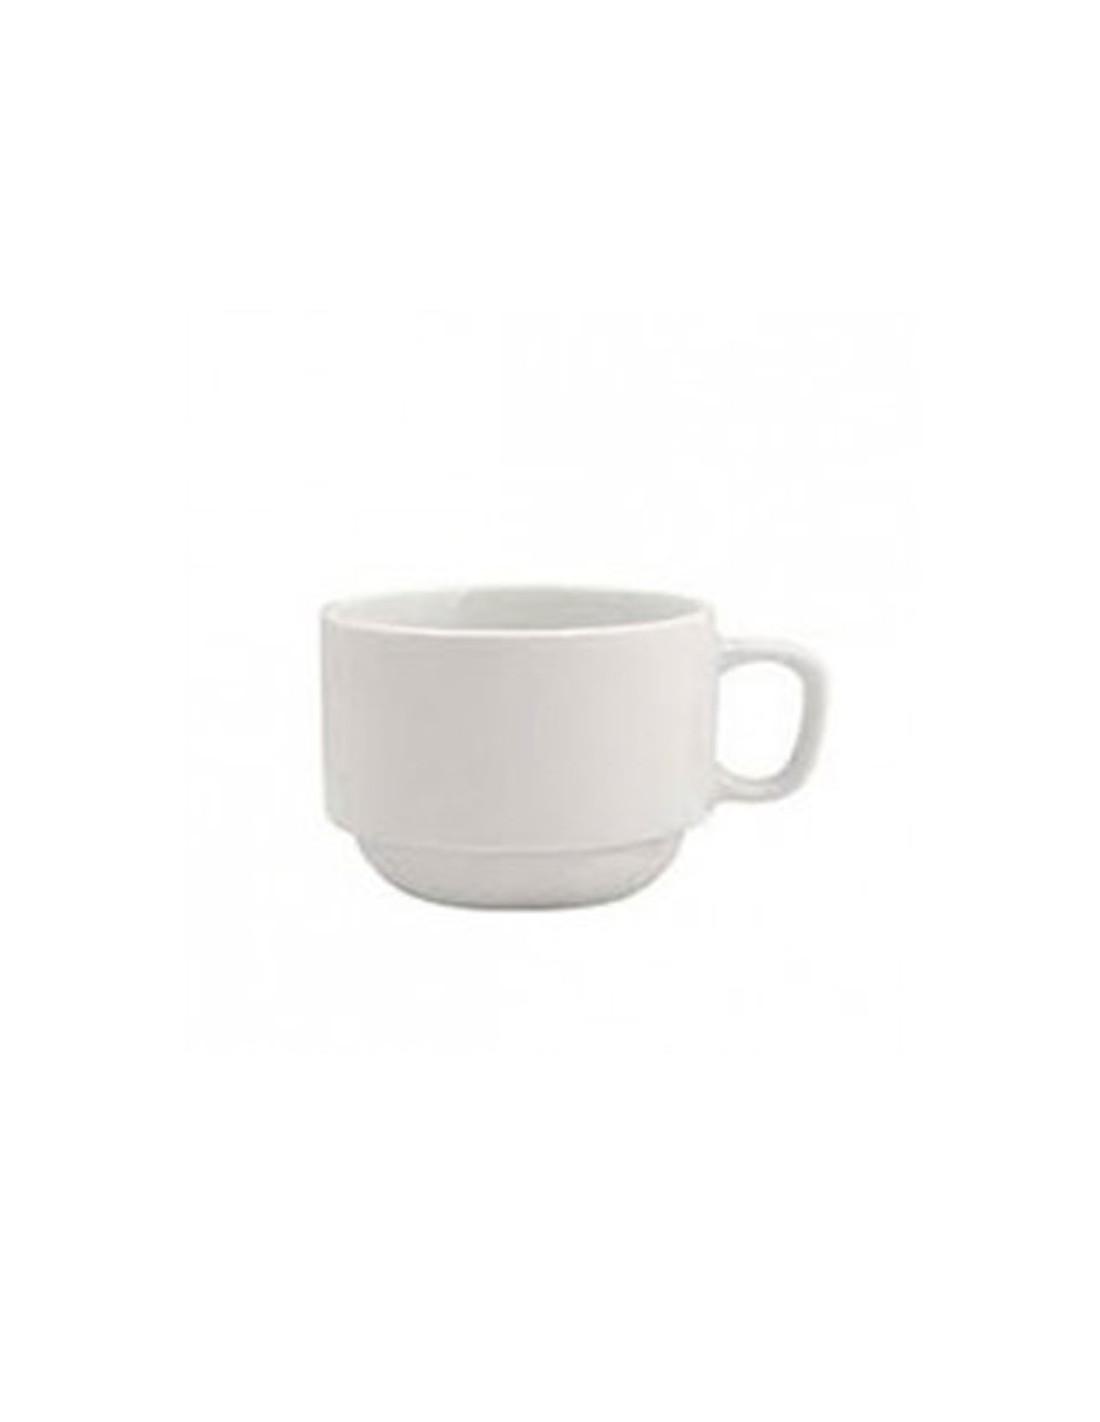 Taza para cafe de porcelana maui 210 ml libbey world 840 - Taza termica para cafe ...